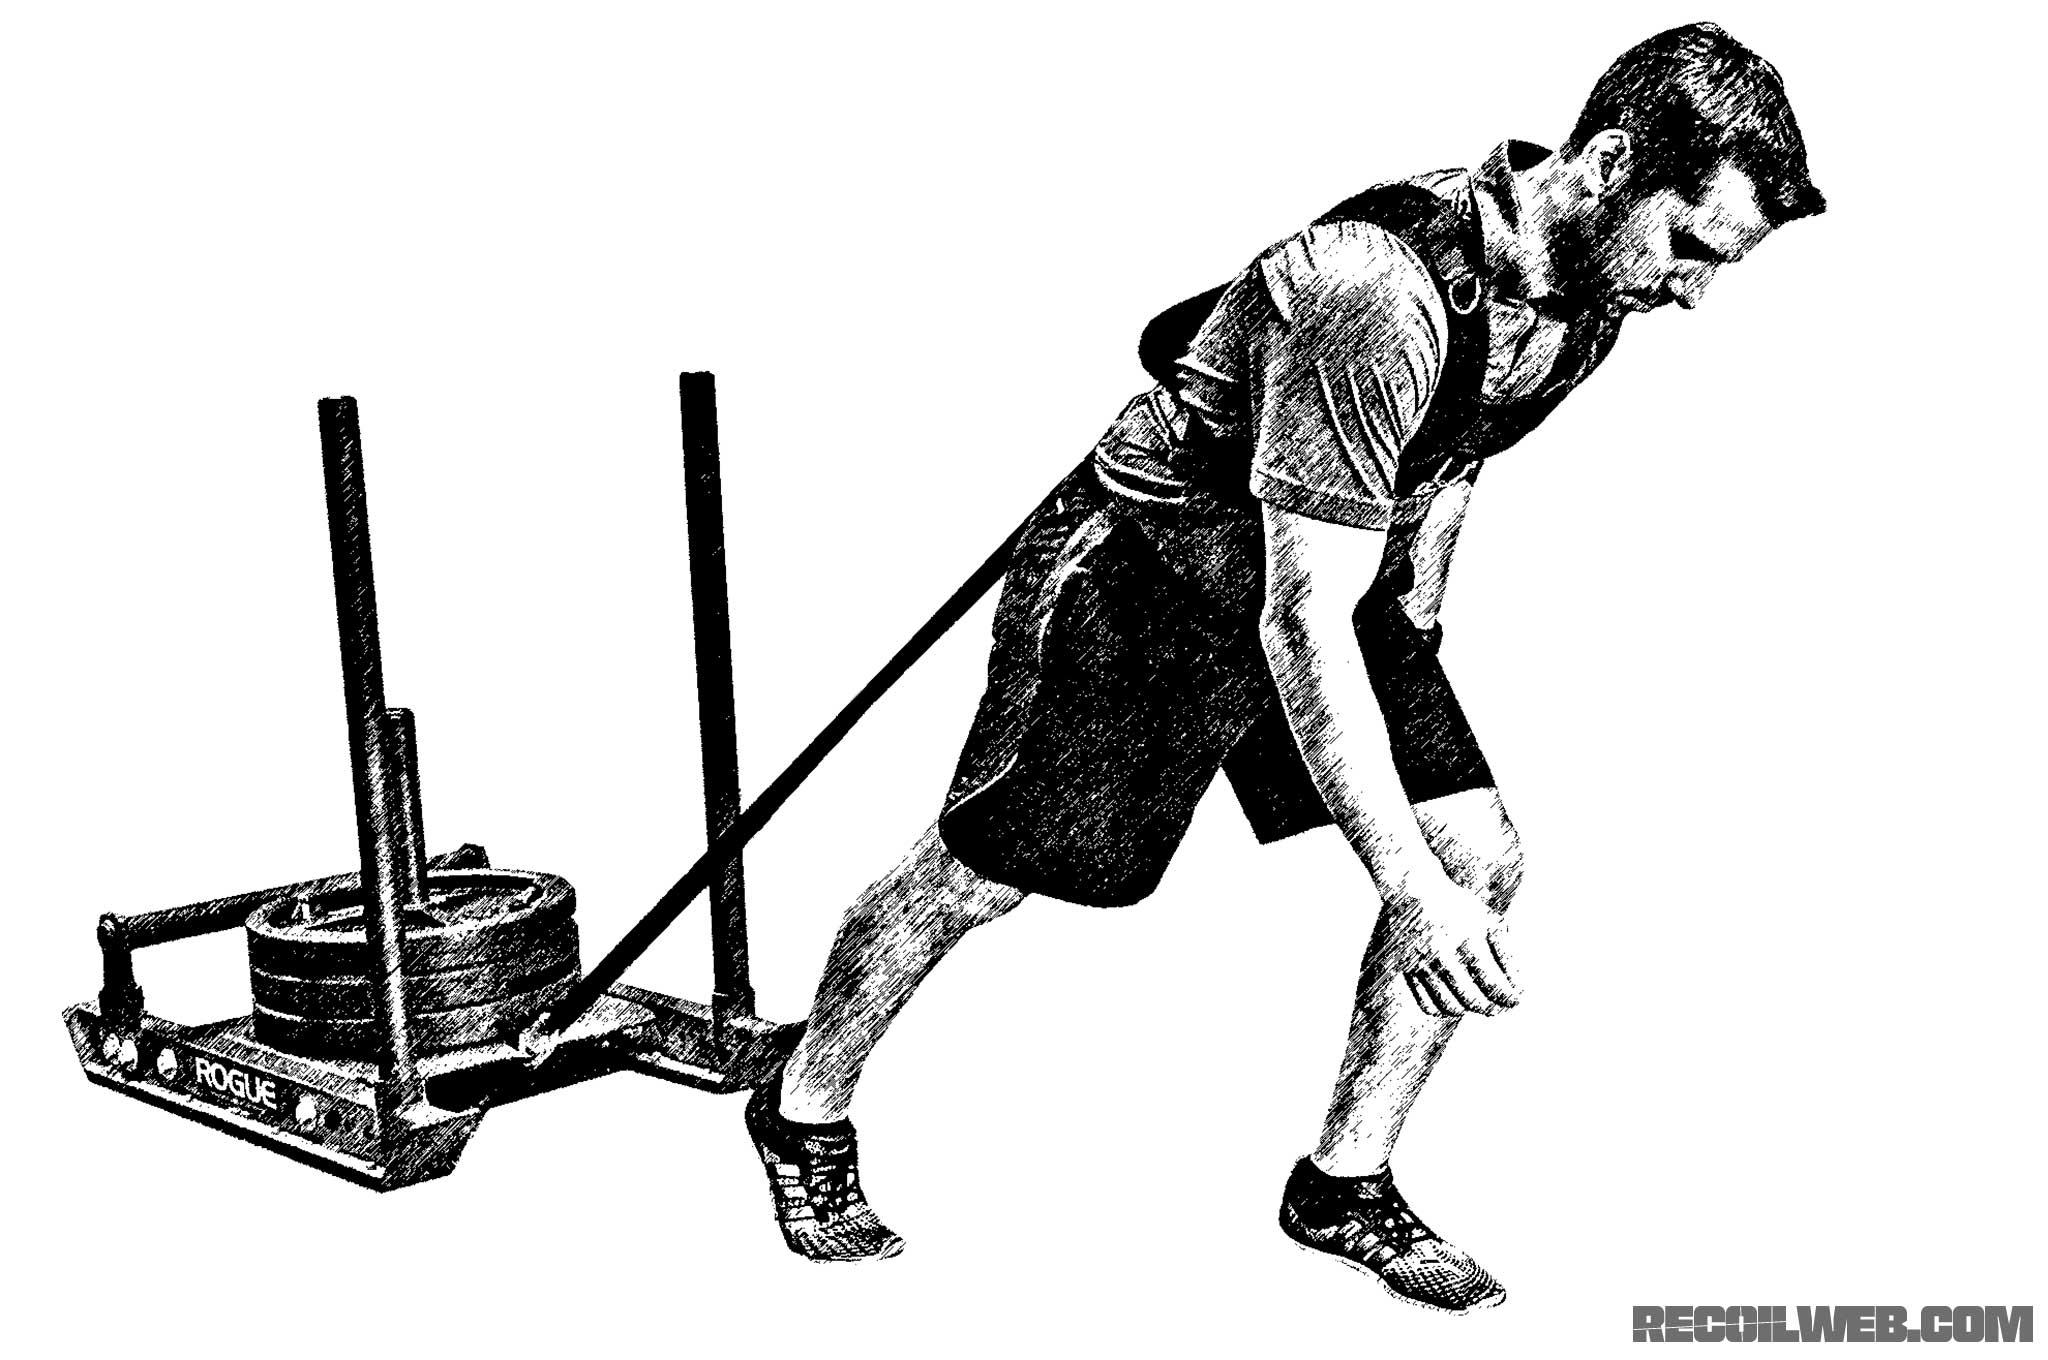 Strongman Training For The Average Joe